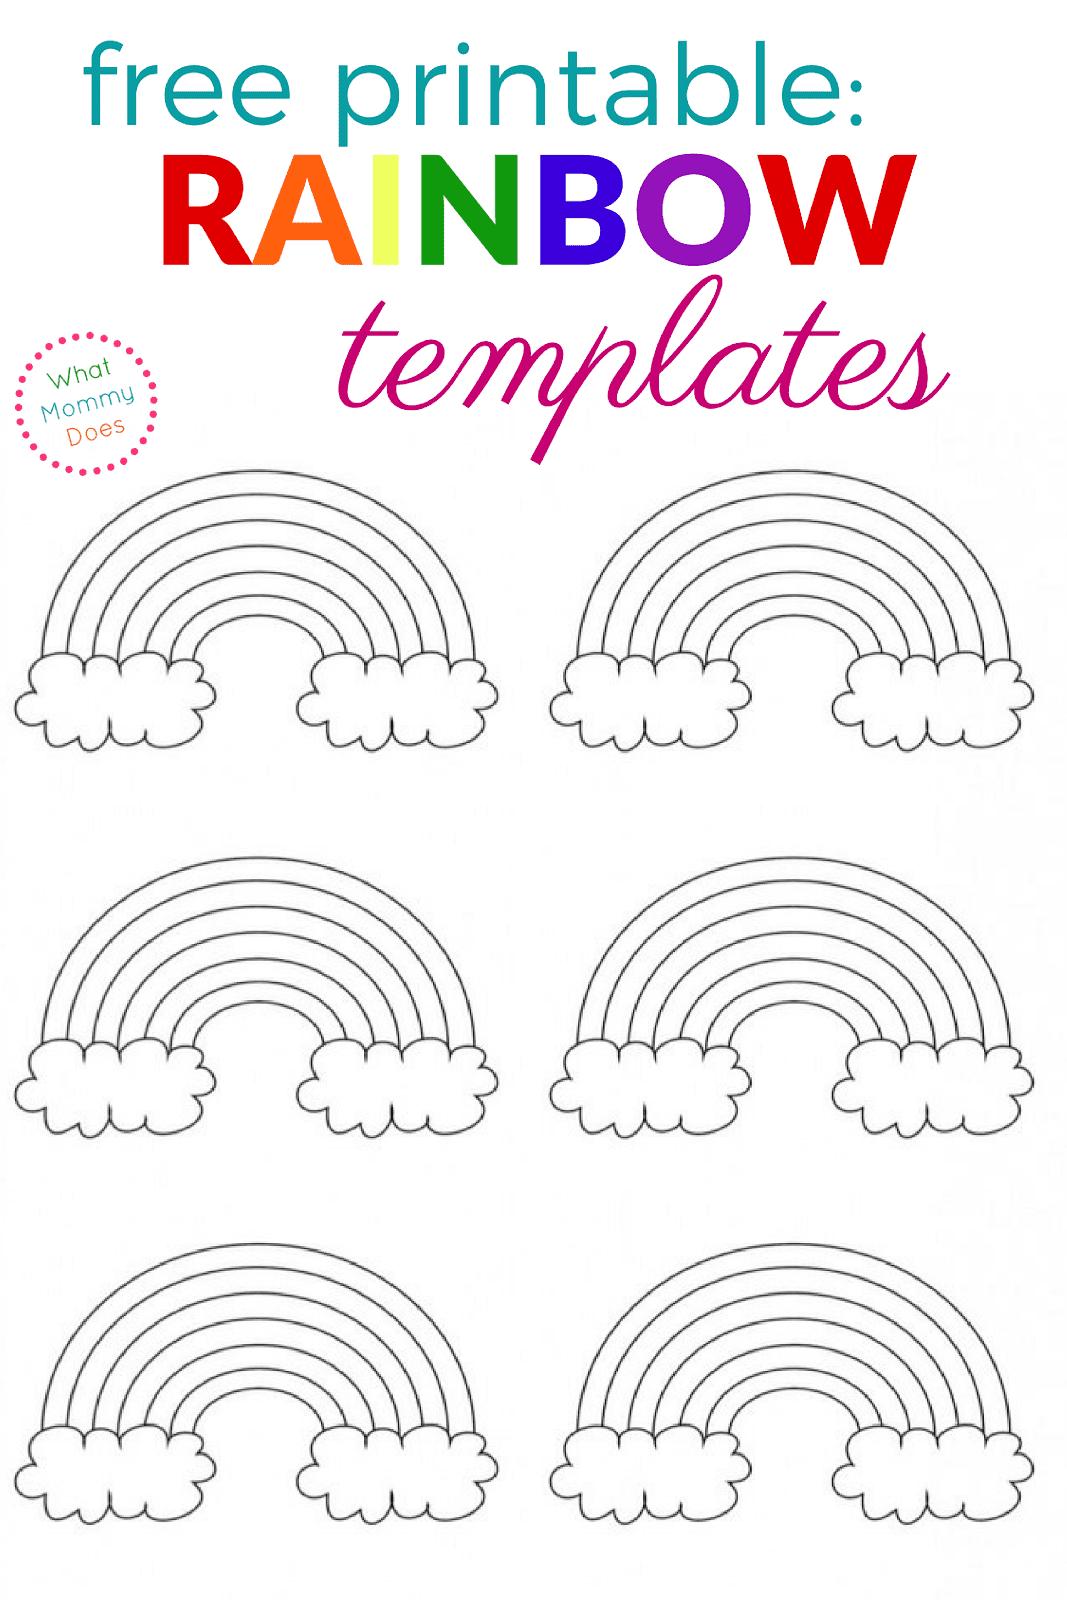 Free Printable Rainbow Templates